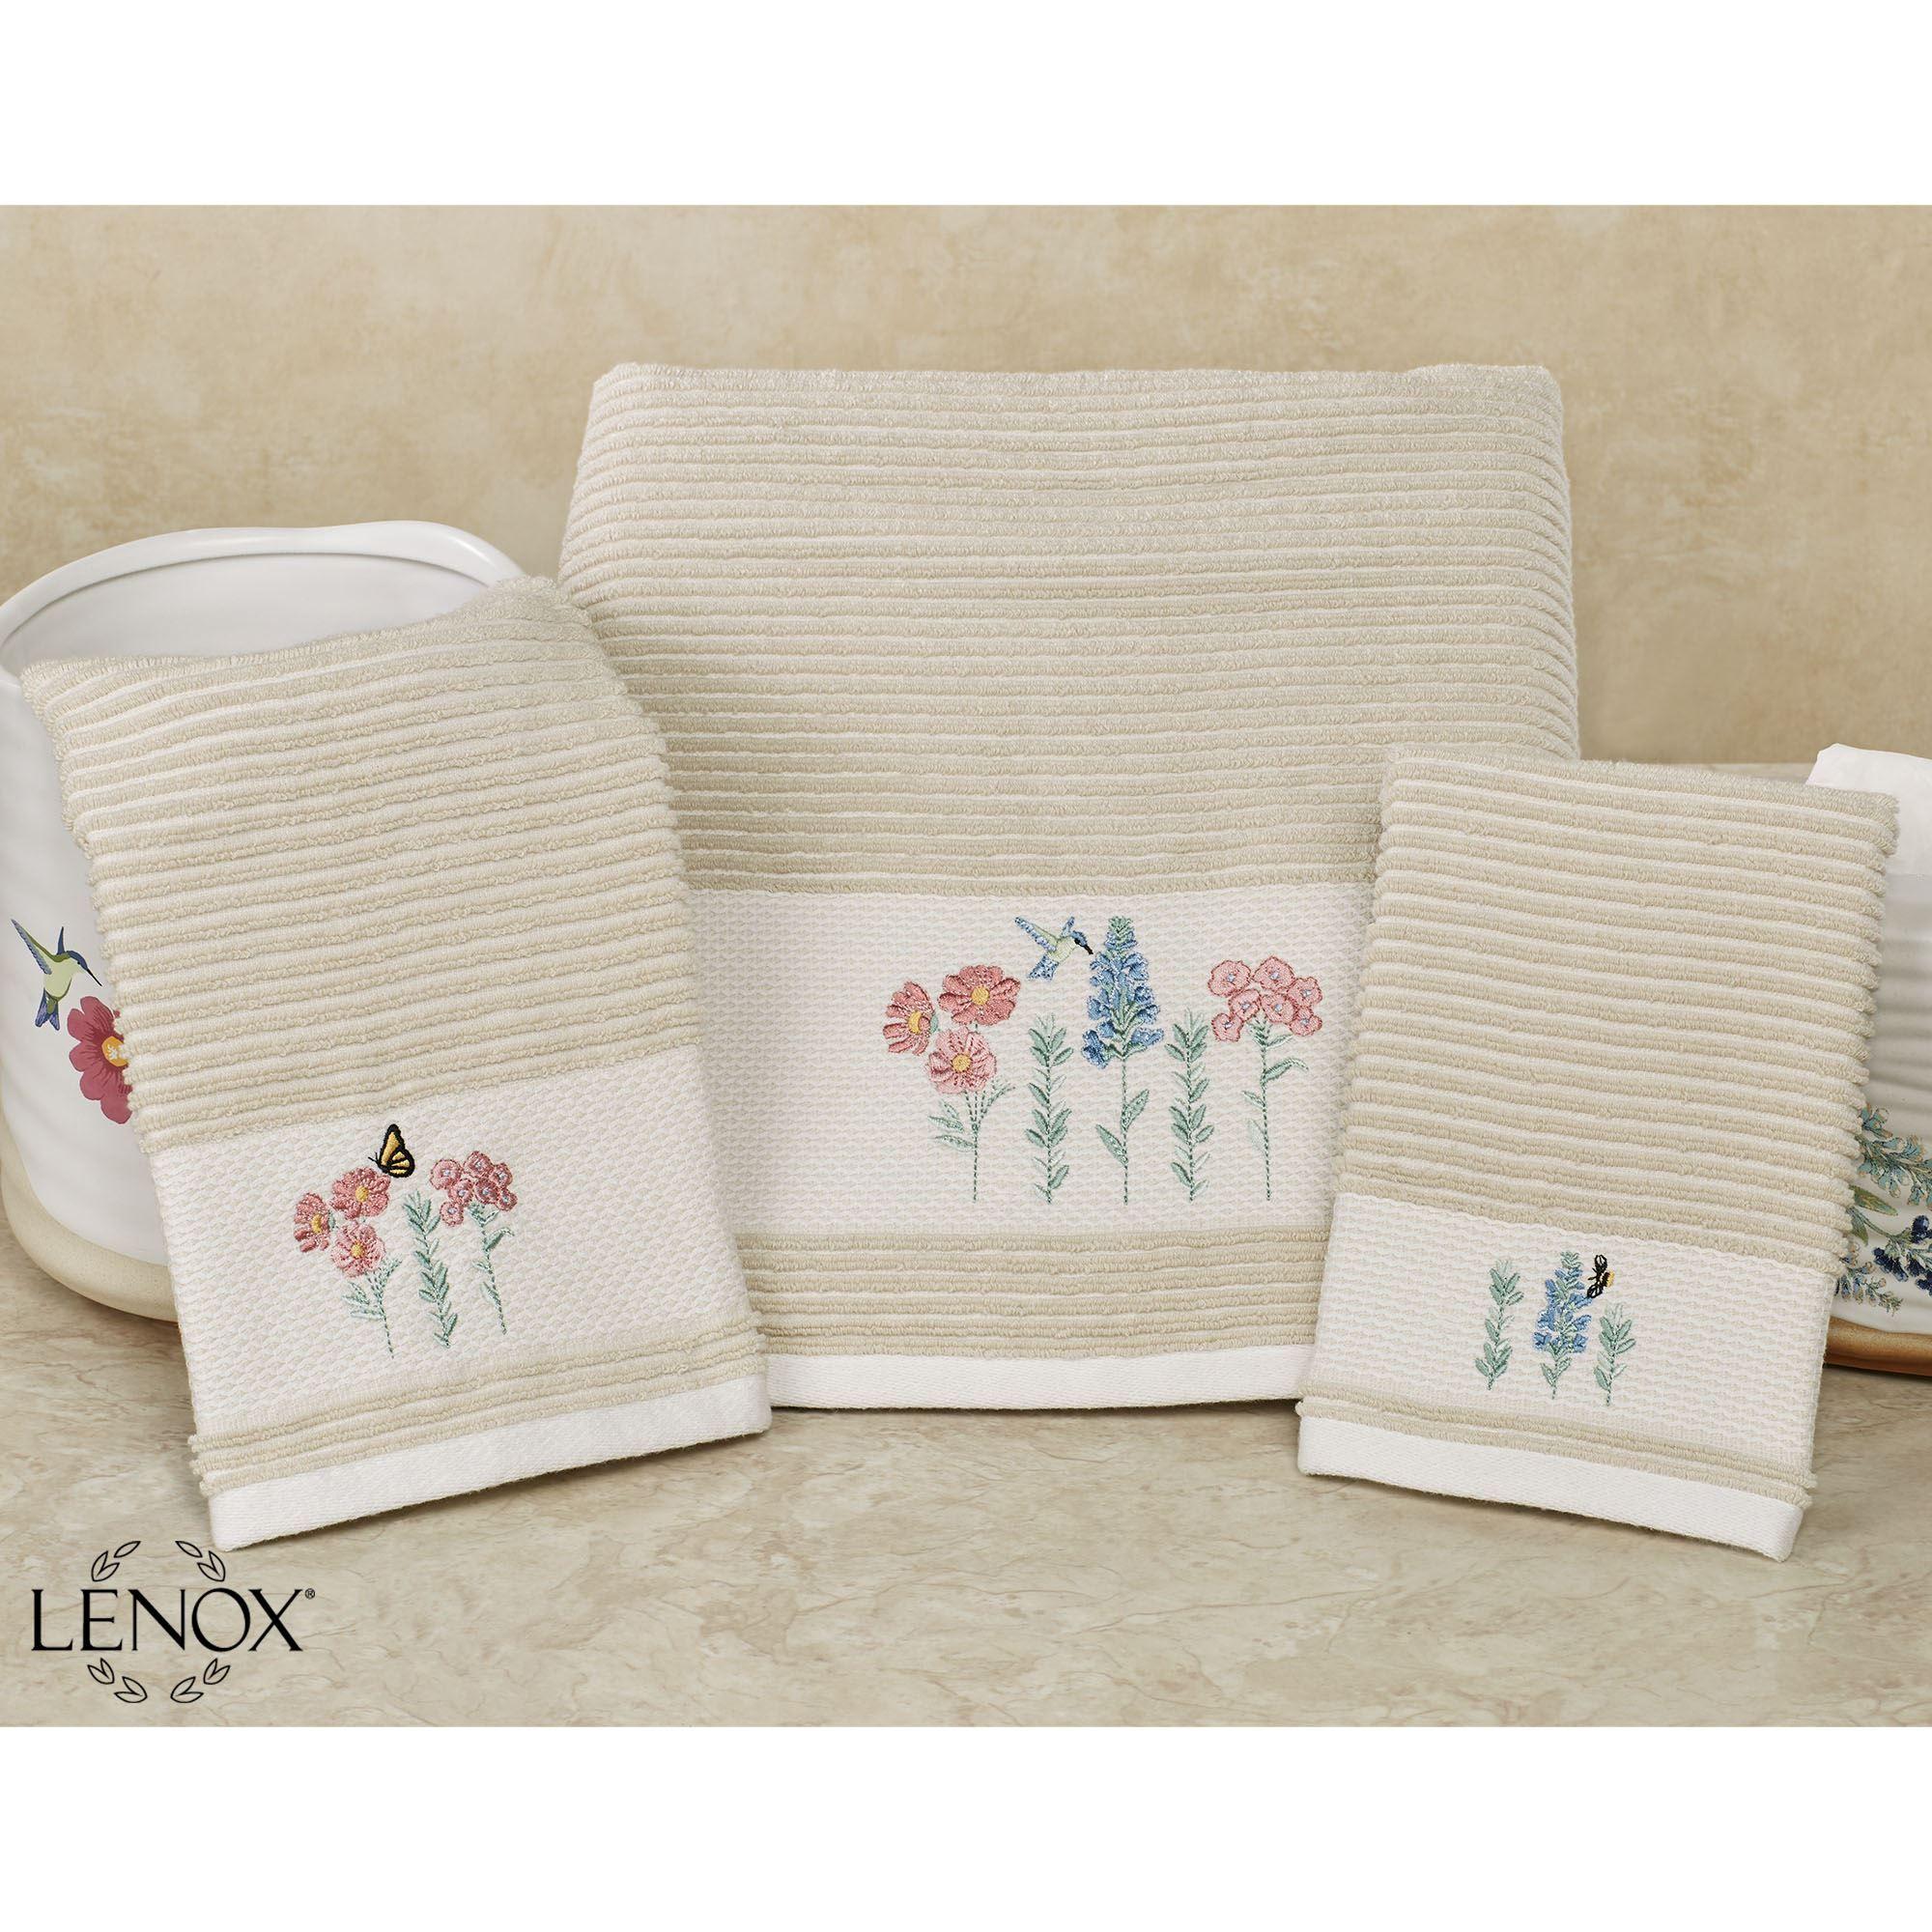 c25bc20671 Lenox Meadow Birds Embroidered Floral Bath Towel Set